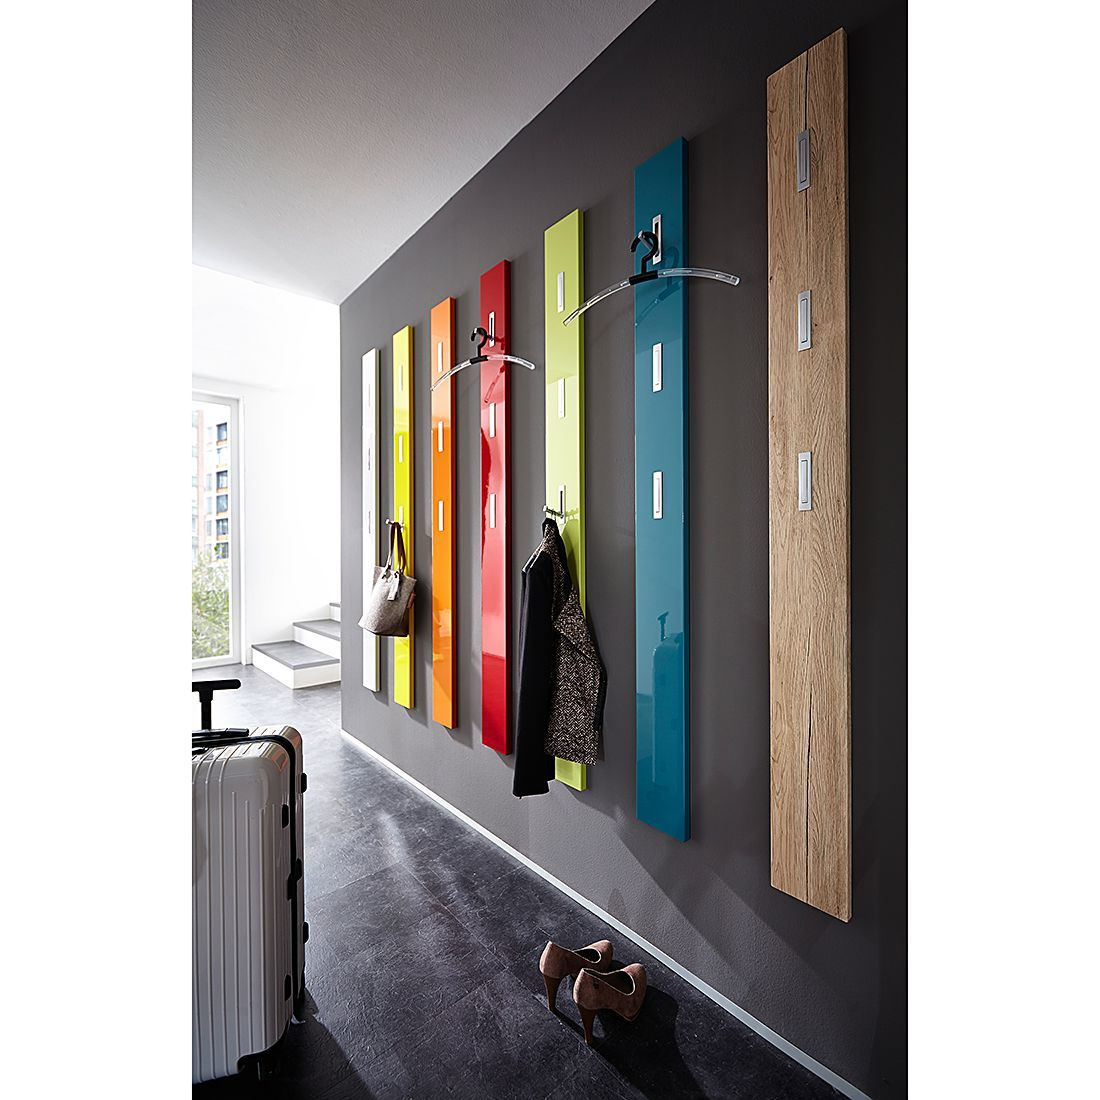 Dielenmobel Garderobenpaneele Jetzt Kaufen Online Garderobenpaneel Colorado Garderobenpaneel Wandgarderobe Flur Mobel